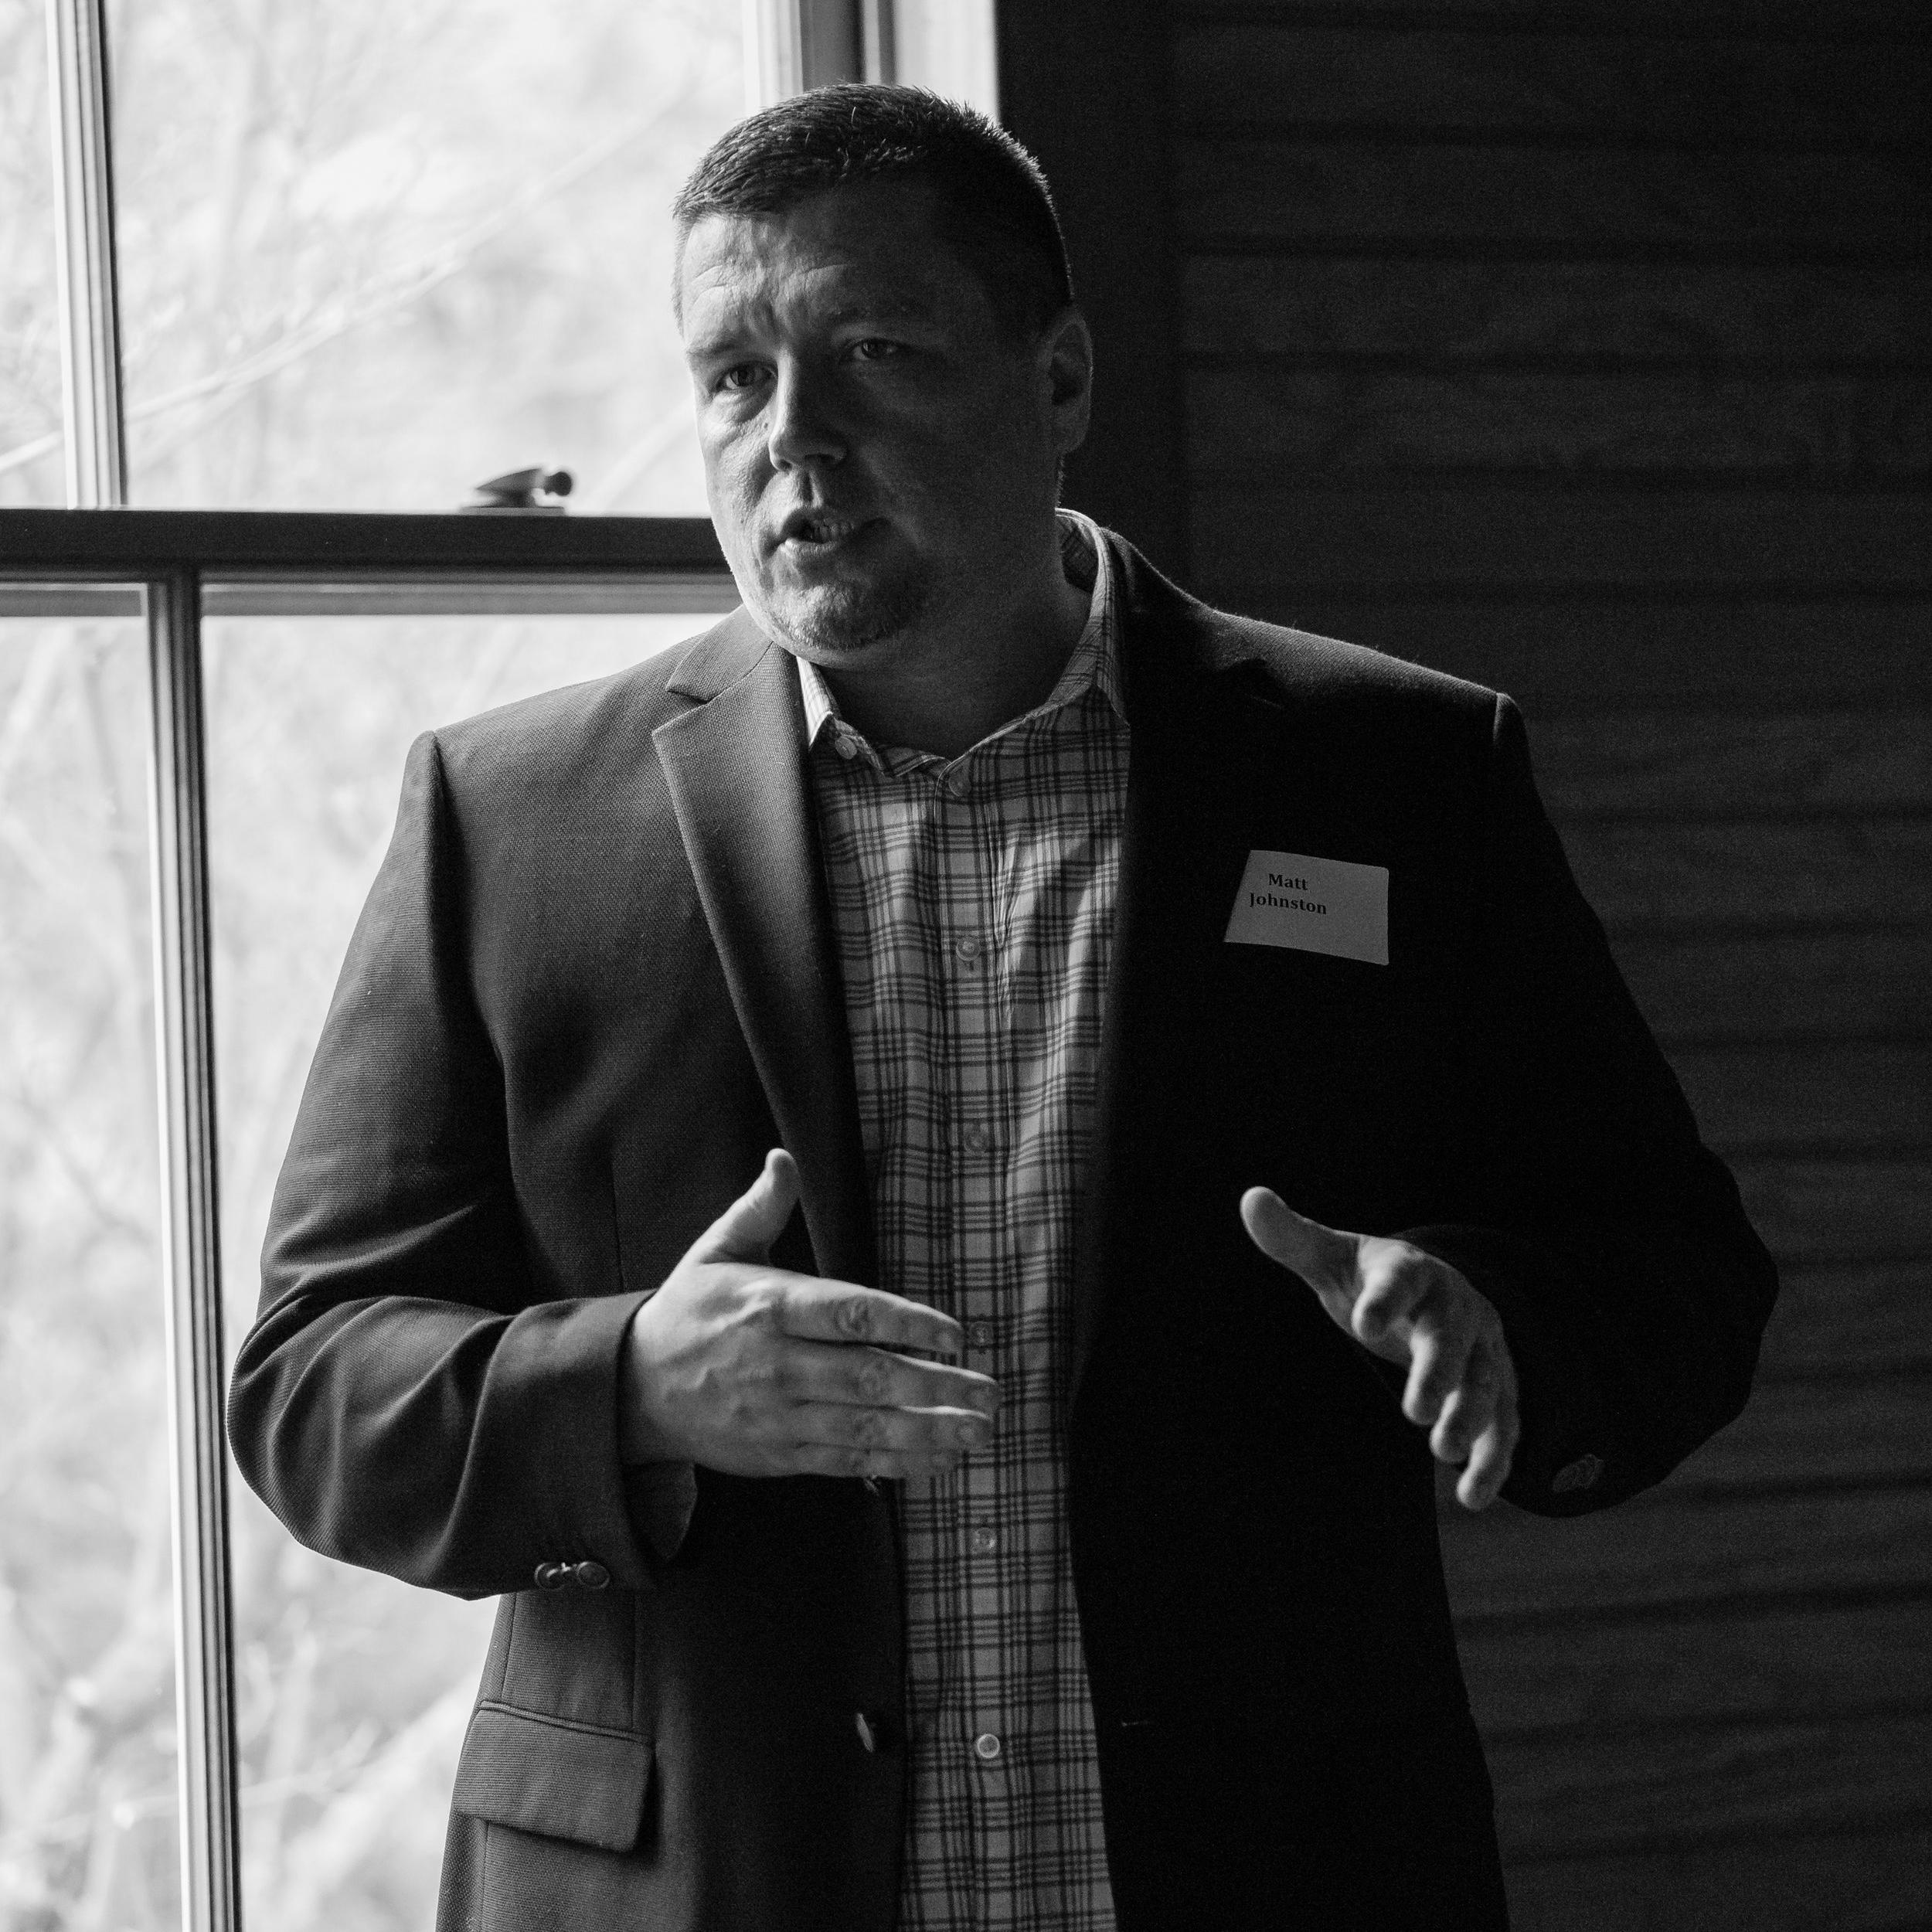 Matt Johnston, CEO, Mautic